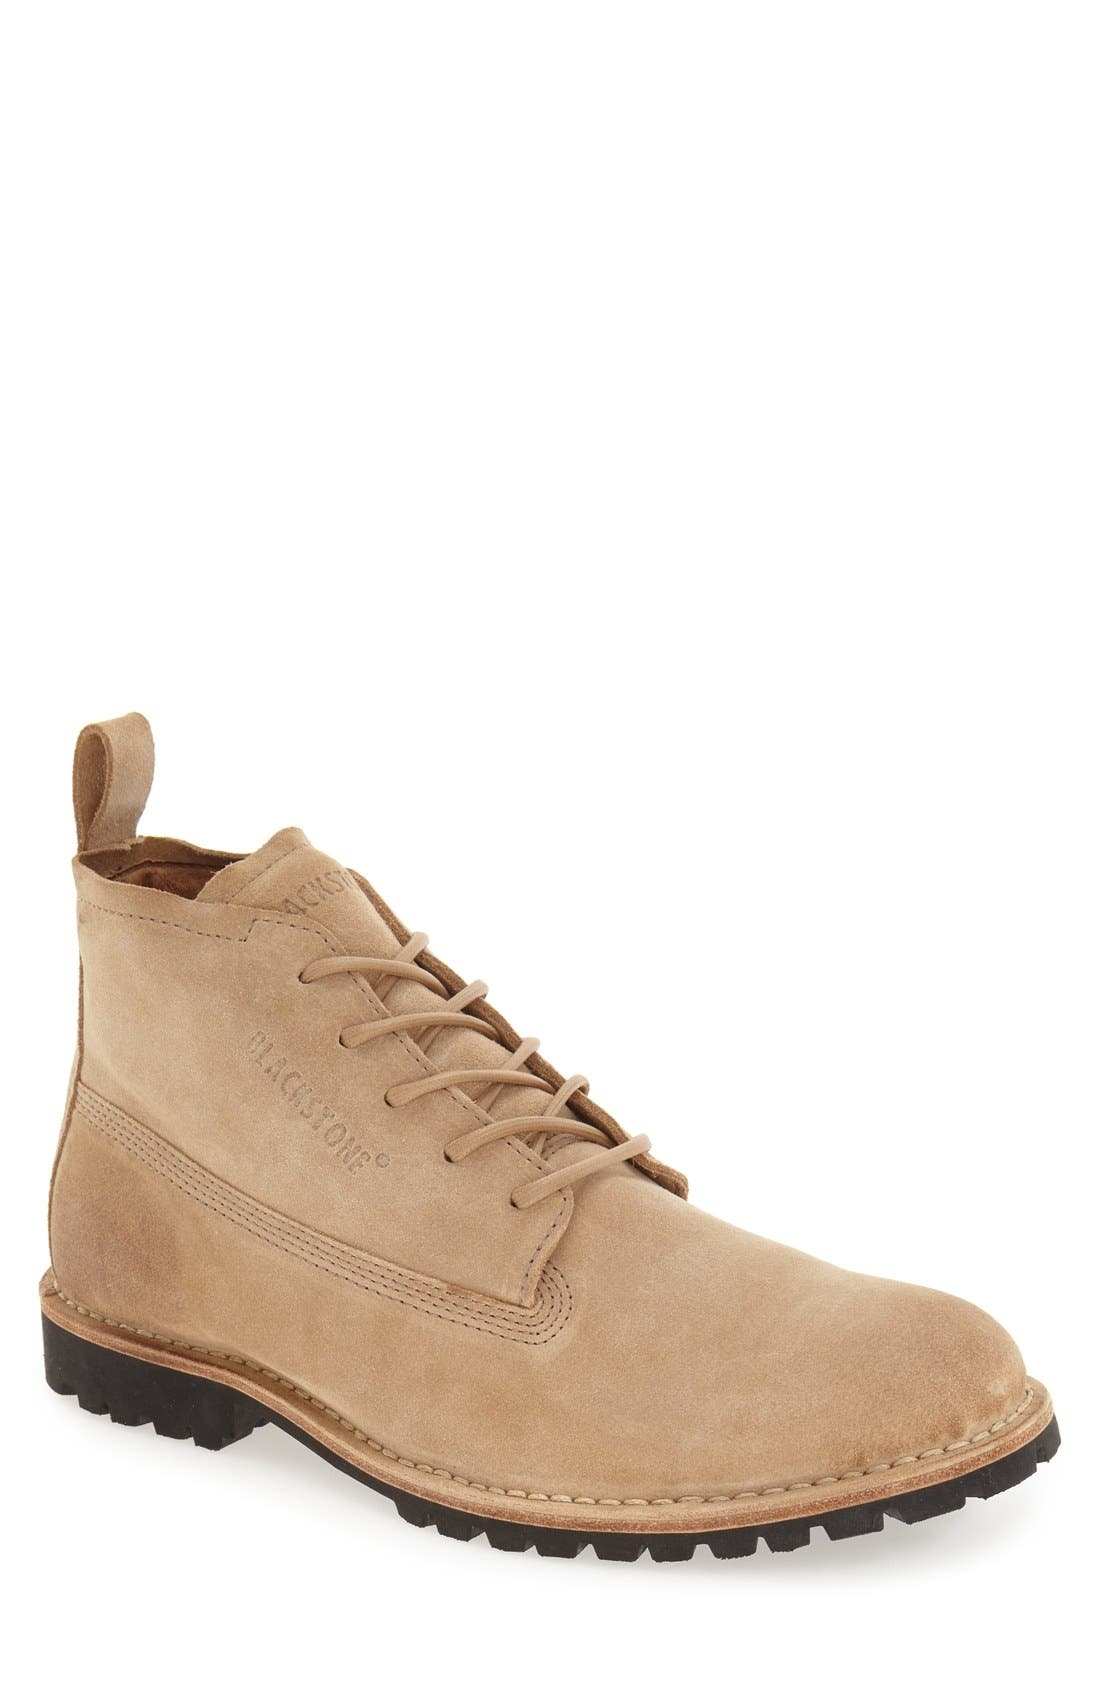 Alternate Image 1 Selected - Blackstone 'KM07' Plain Toe Boot (Men)